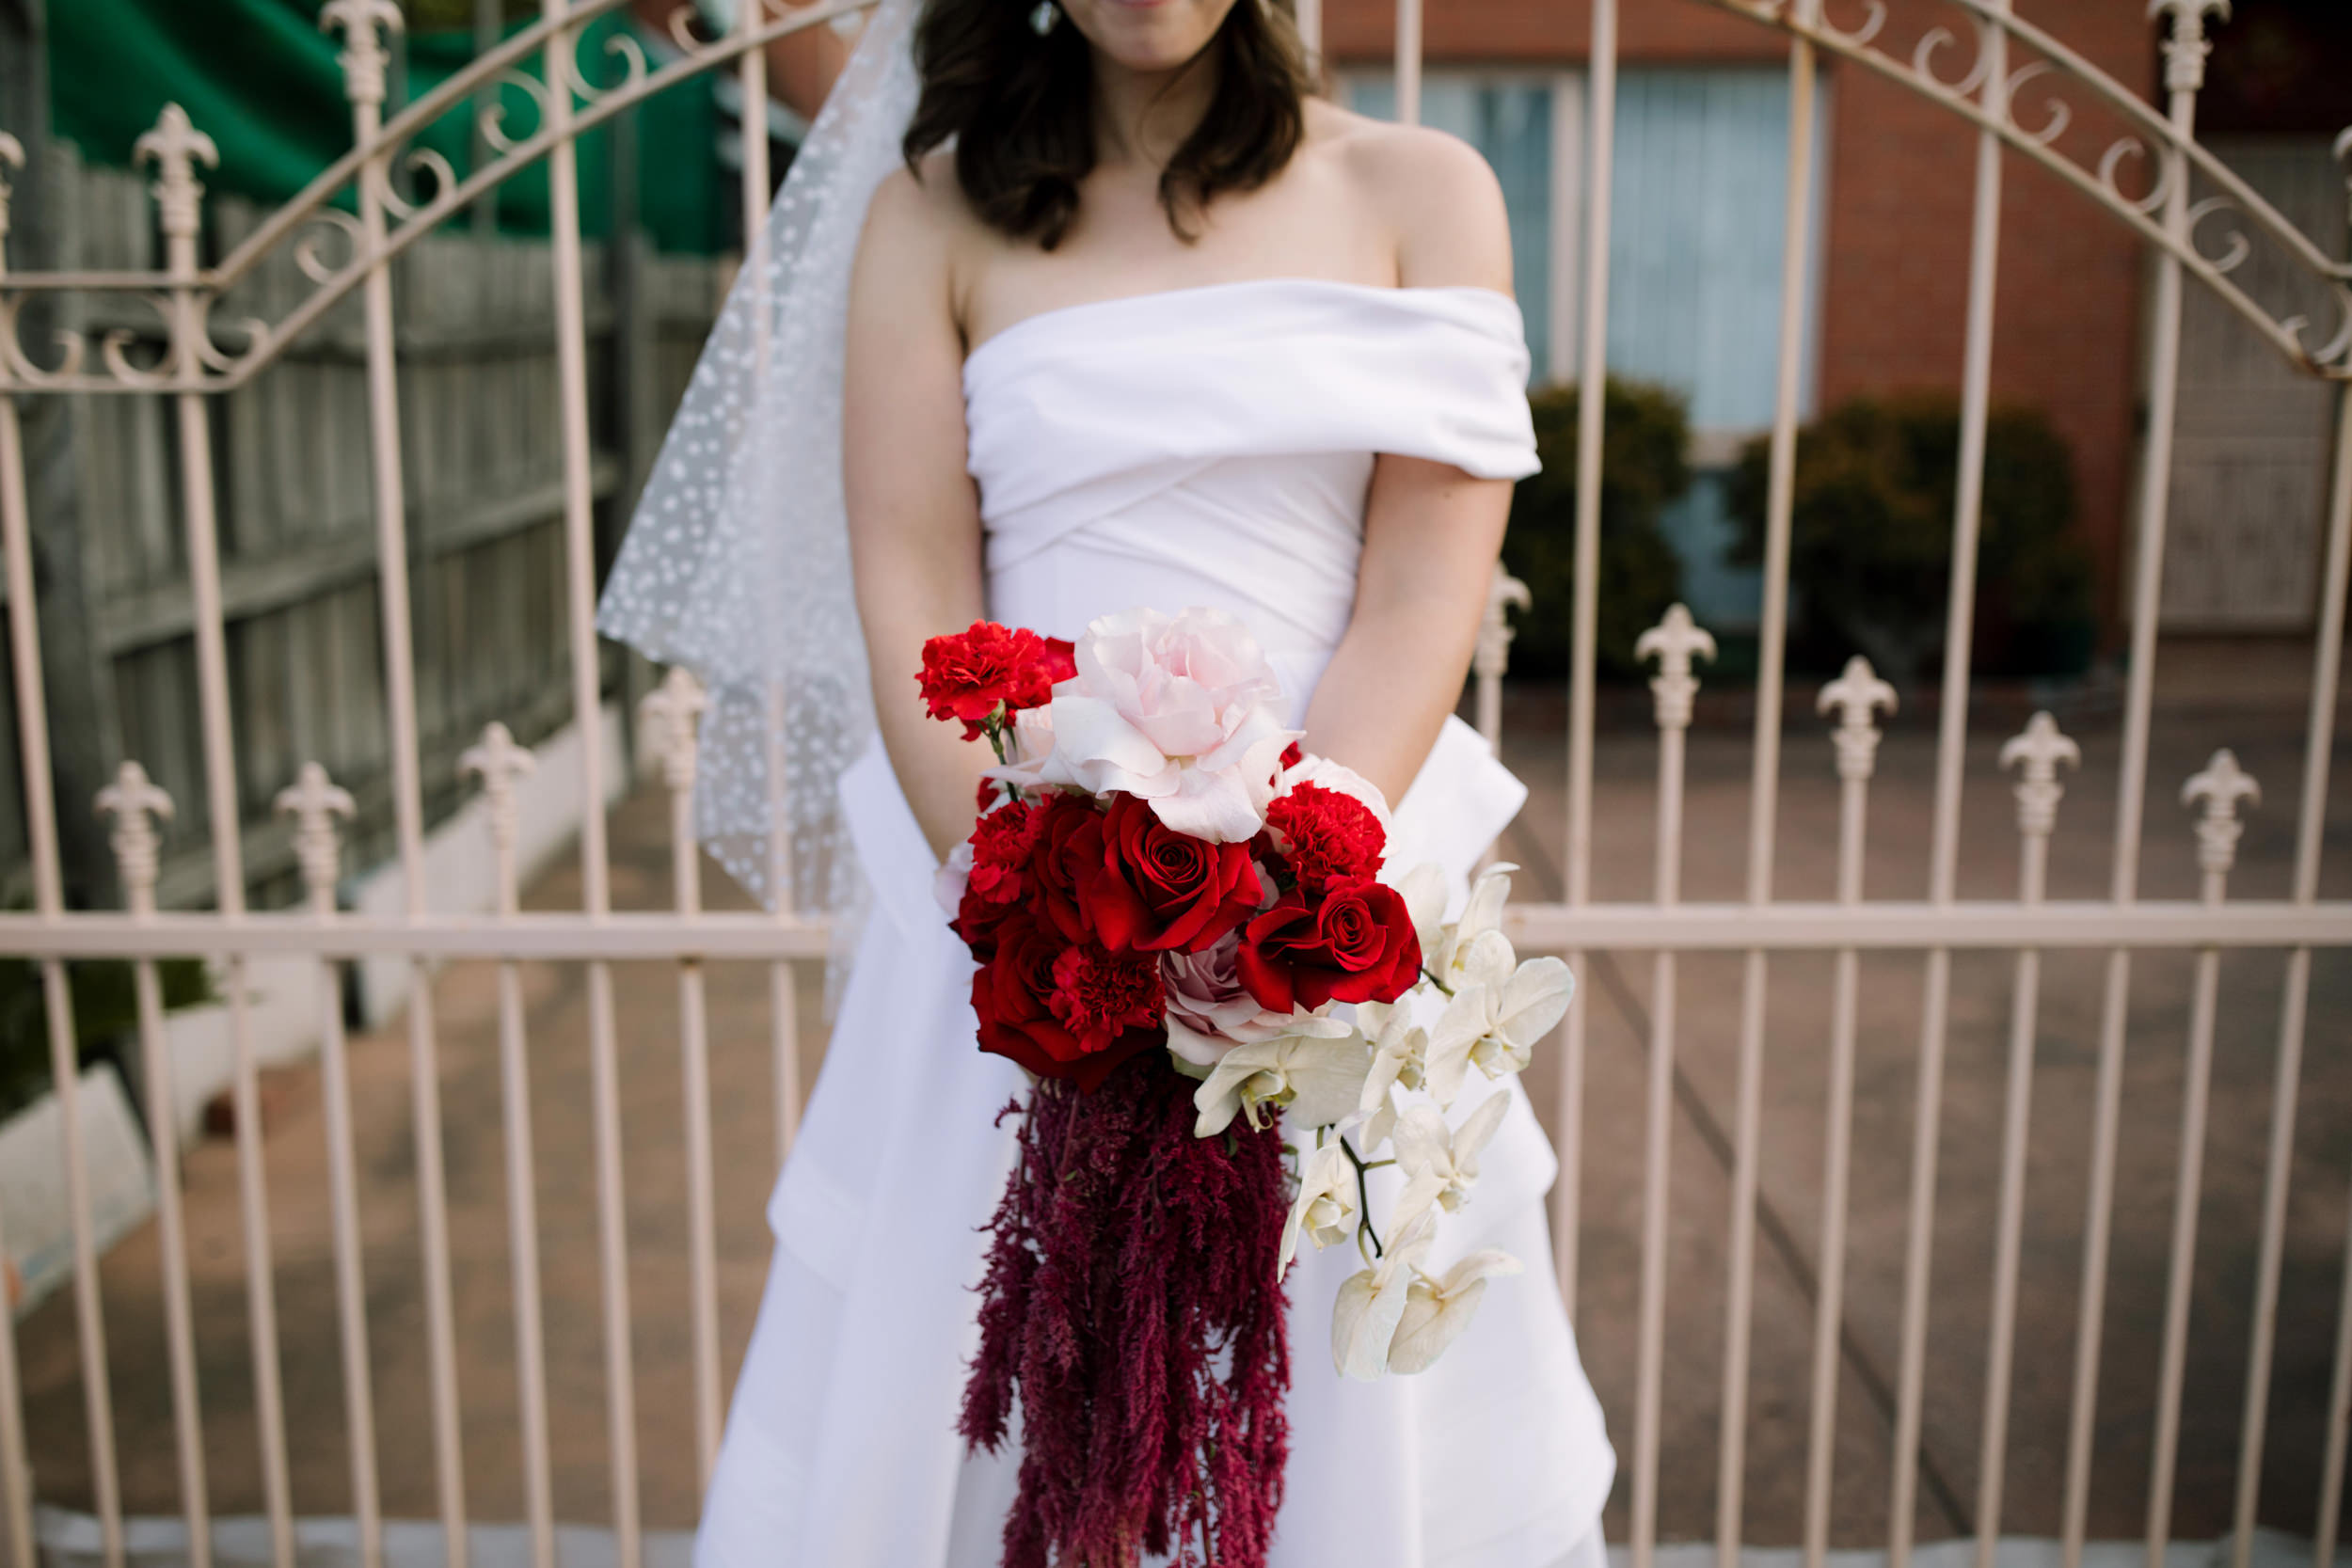 I-Got-You-Babe-Weddings-Tahlia&Mitch-Butler-Lane-Wedding0189.JPG